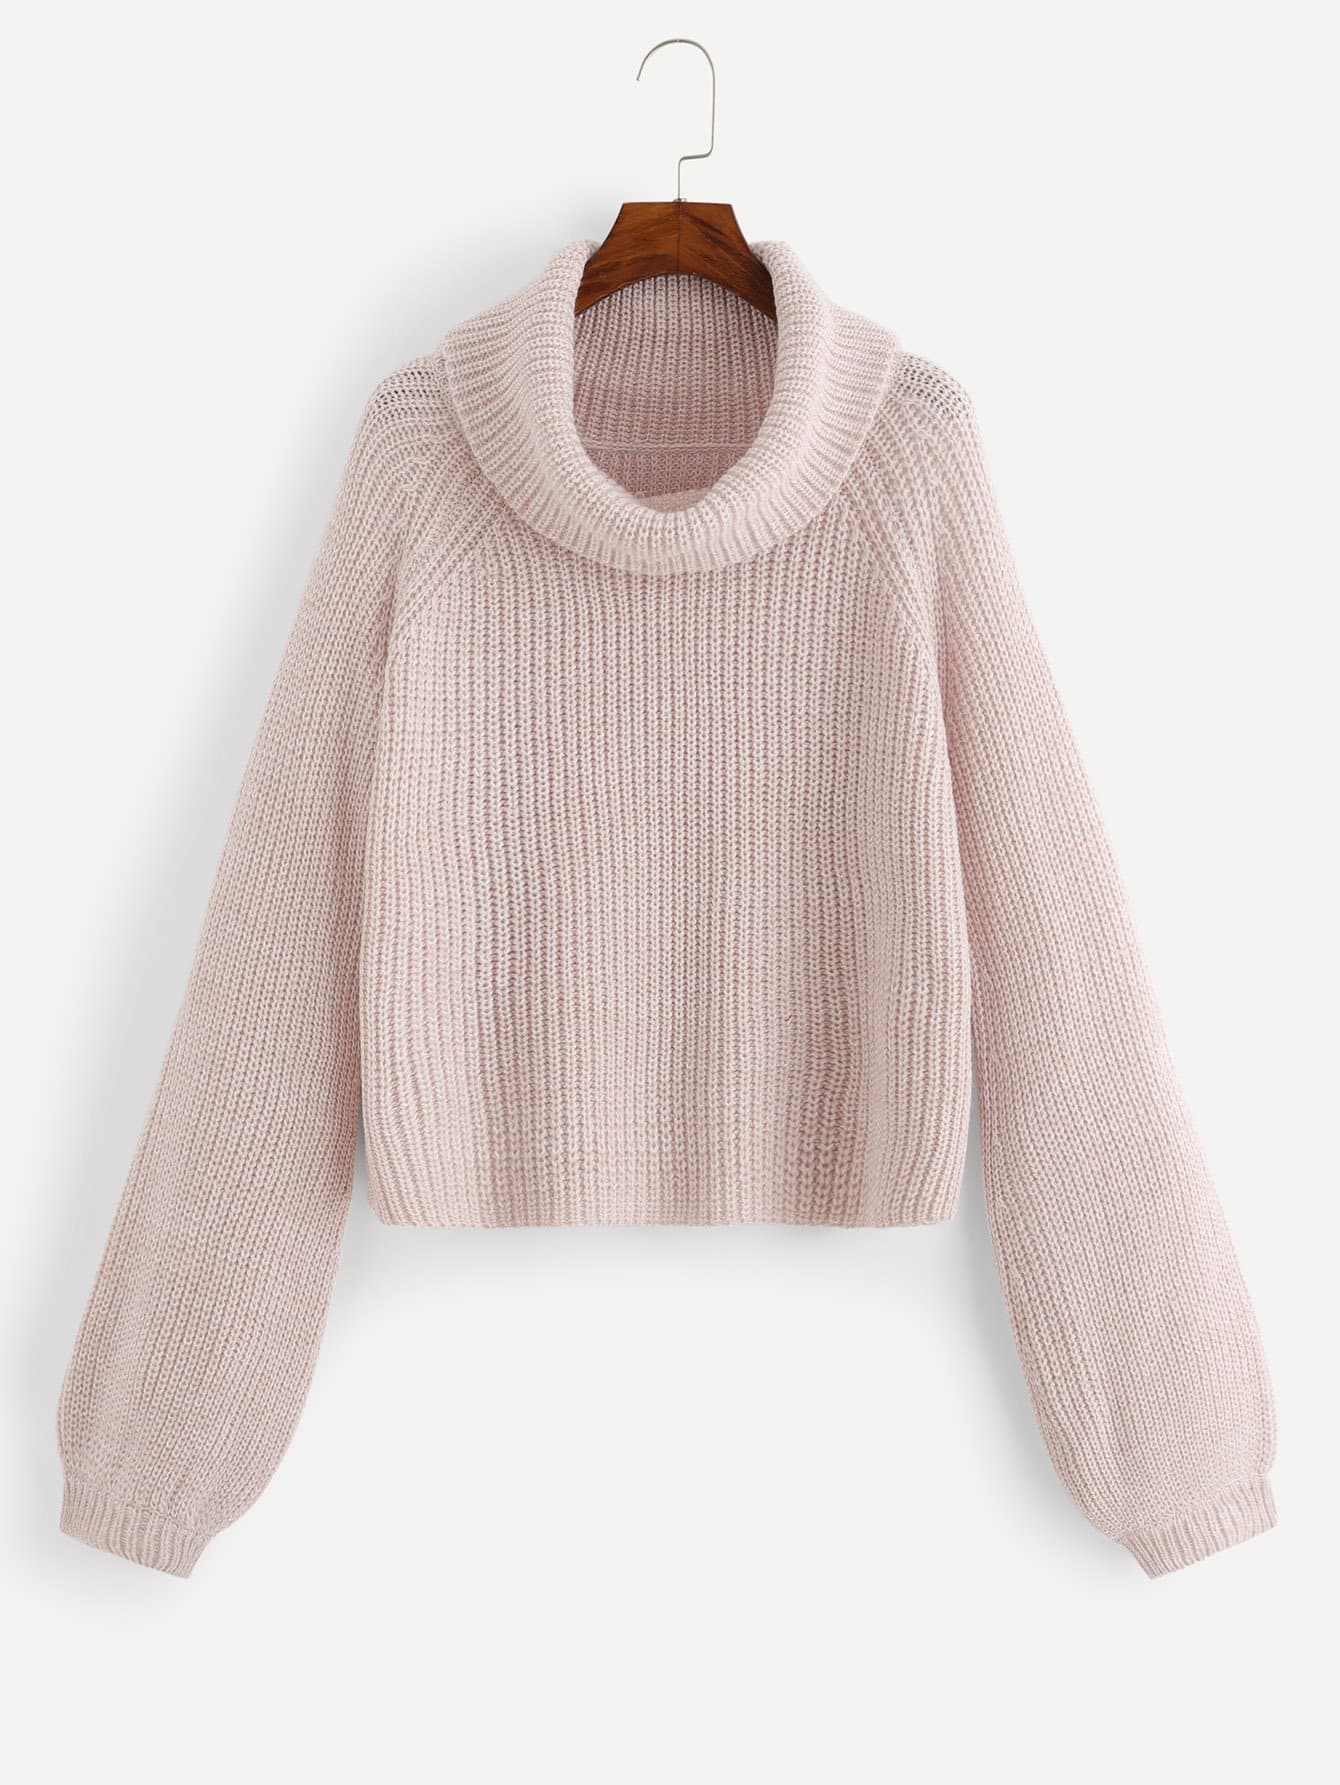 Купить Плюс Ролл-Шея Marled Knit Sweater, null, SheIn